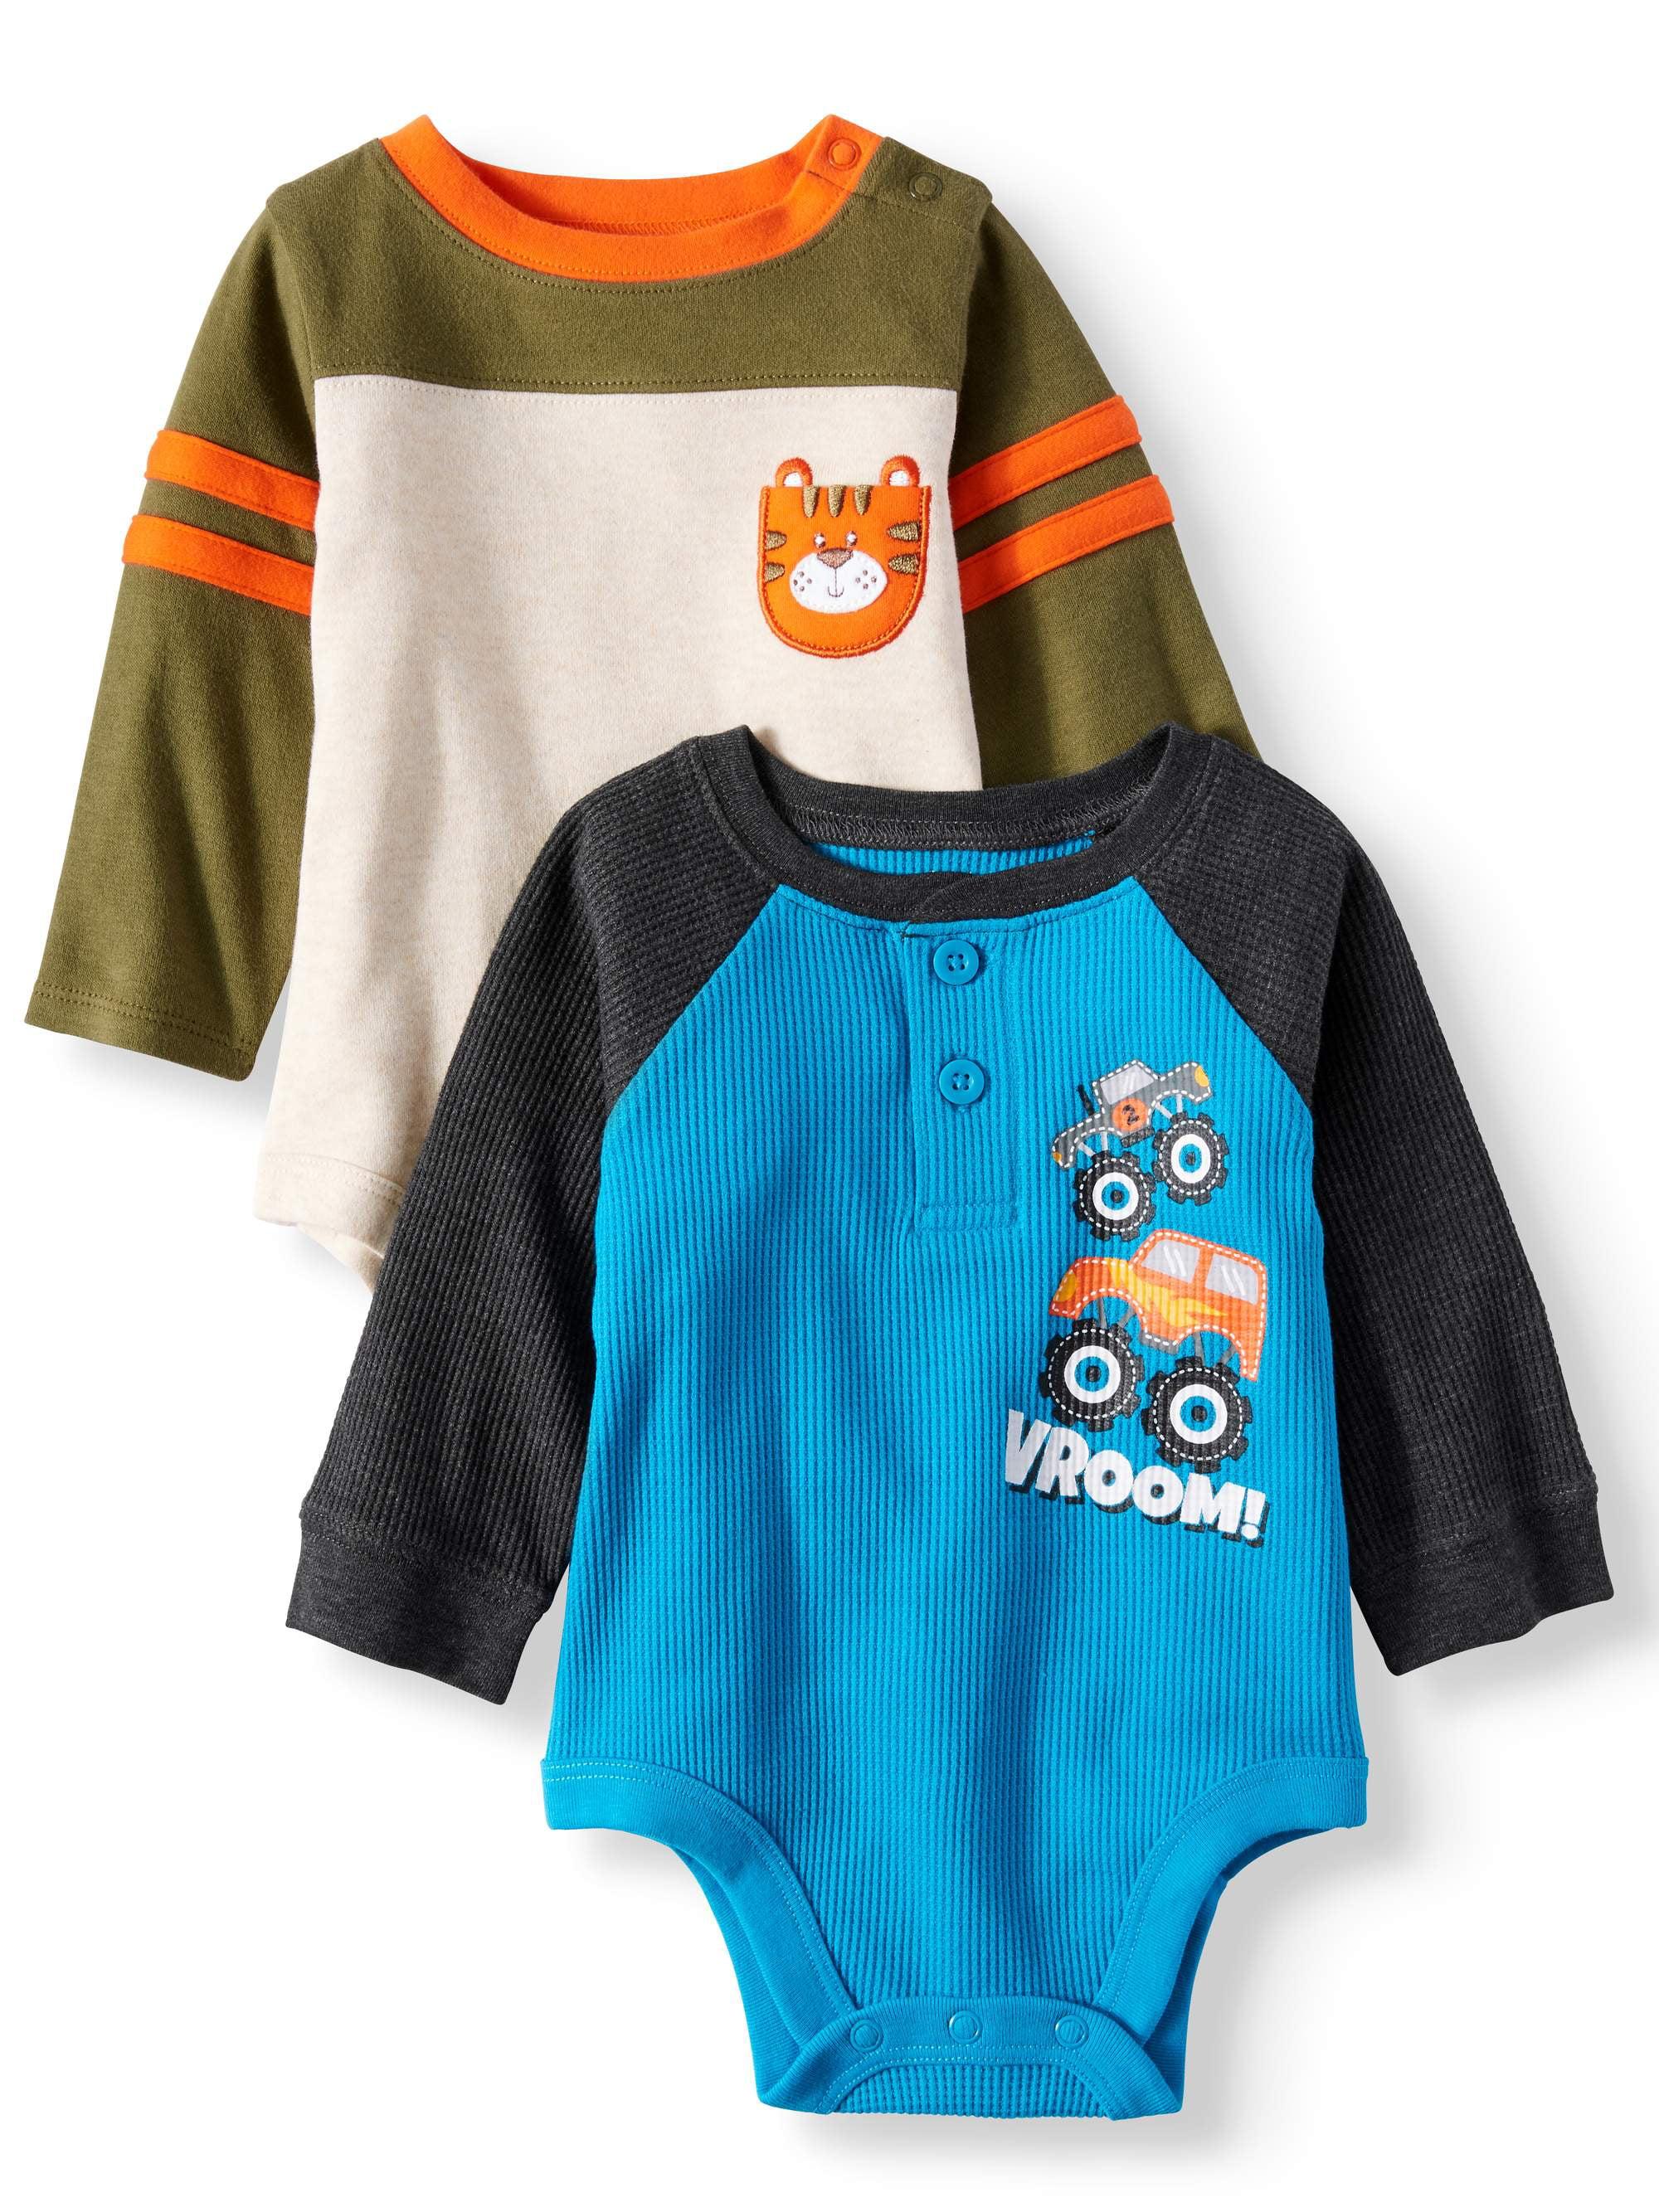 Garanimals Long Sleeve Bodysuits, 2-pack (Baby Boys)